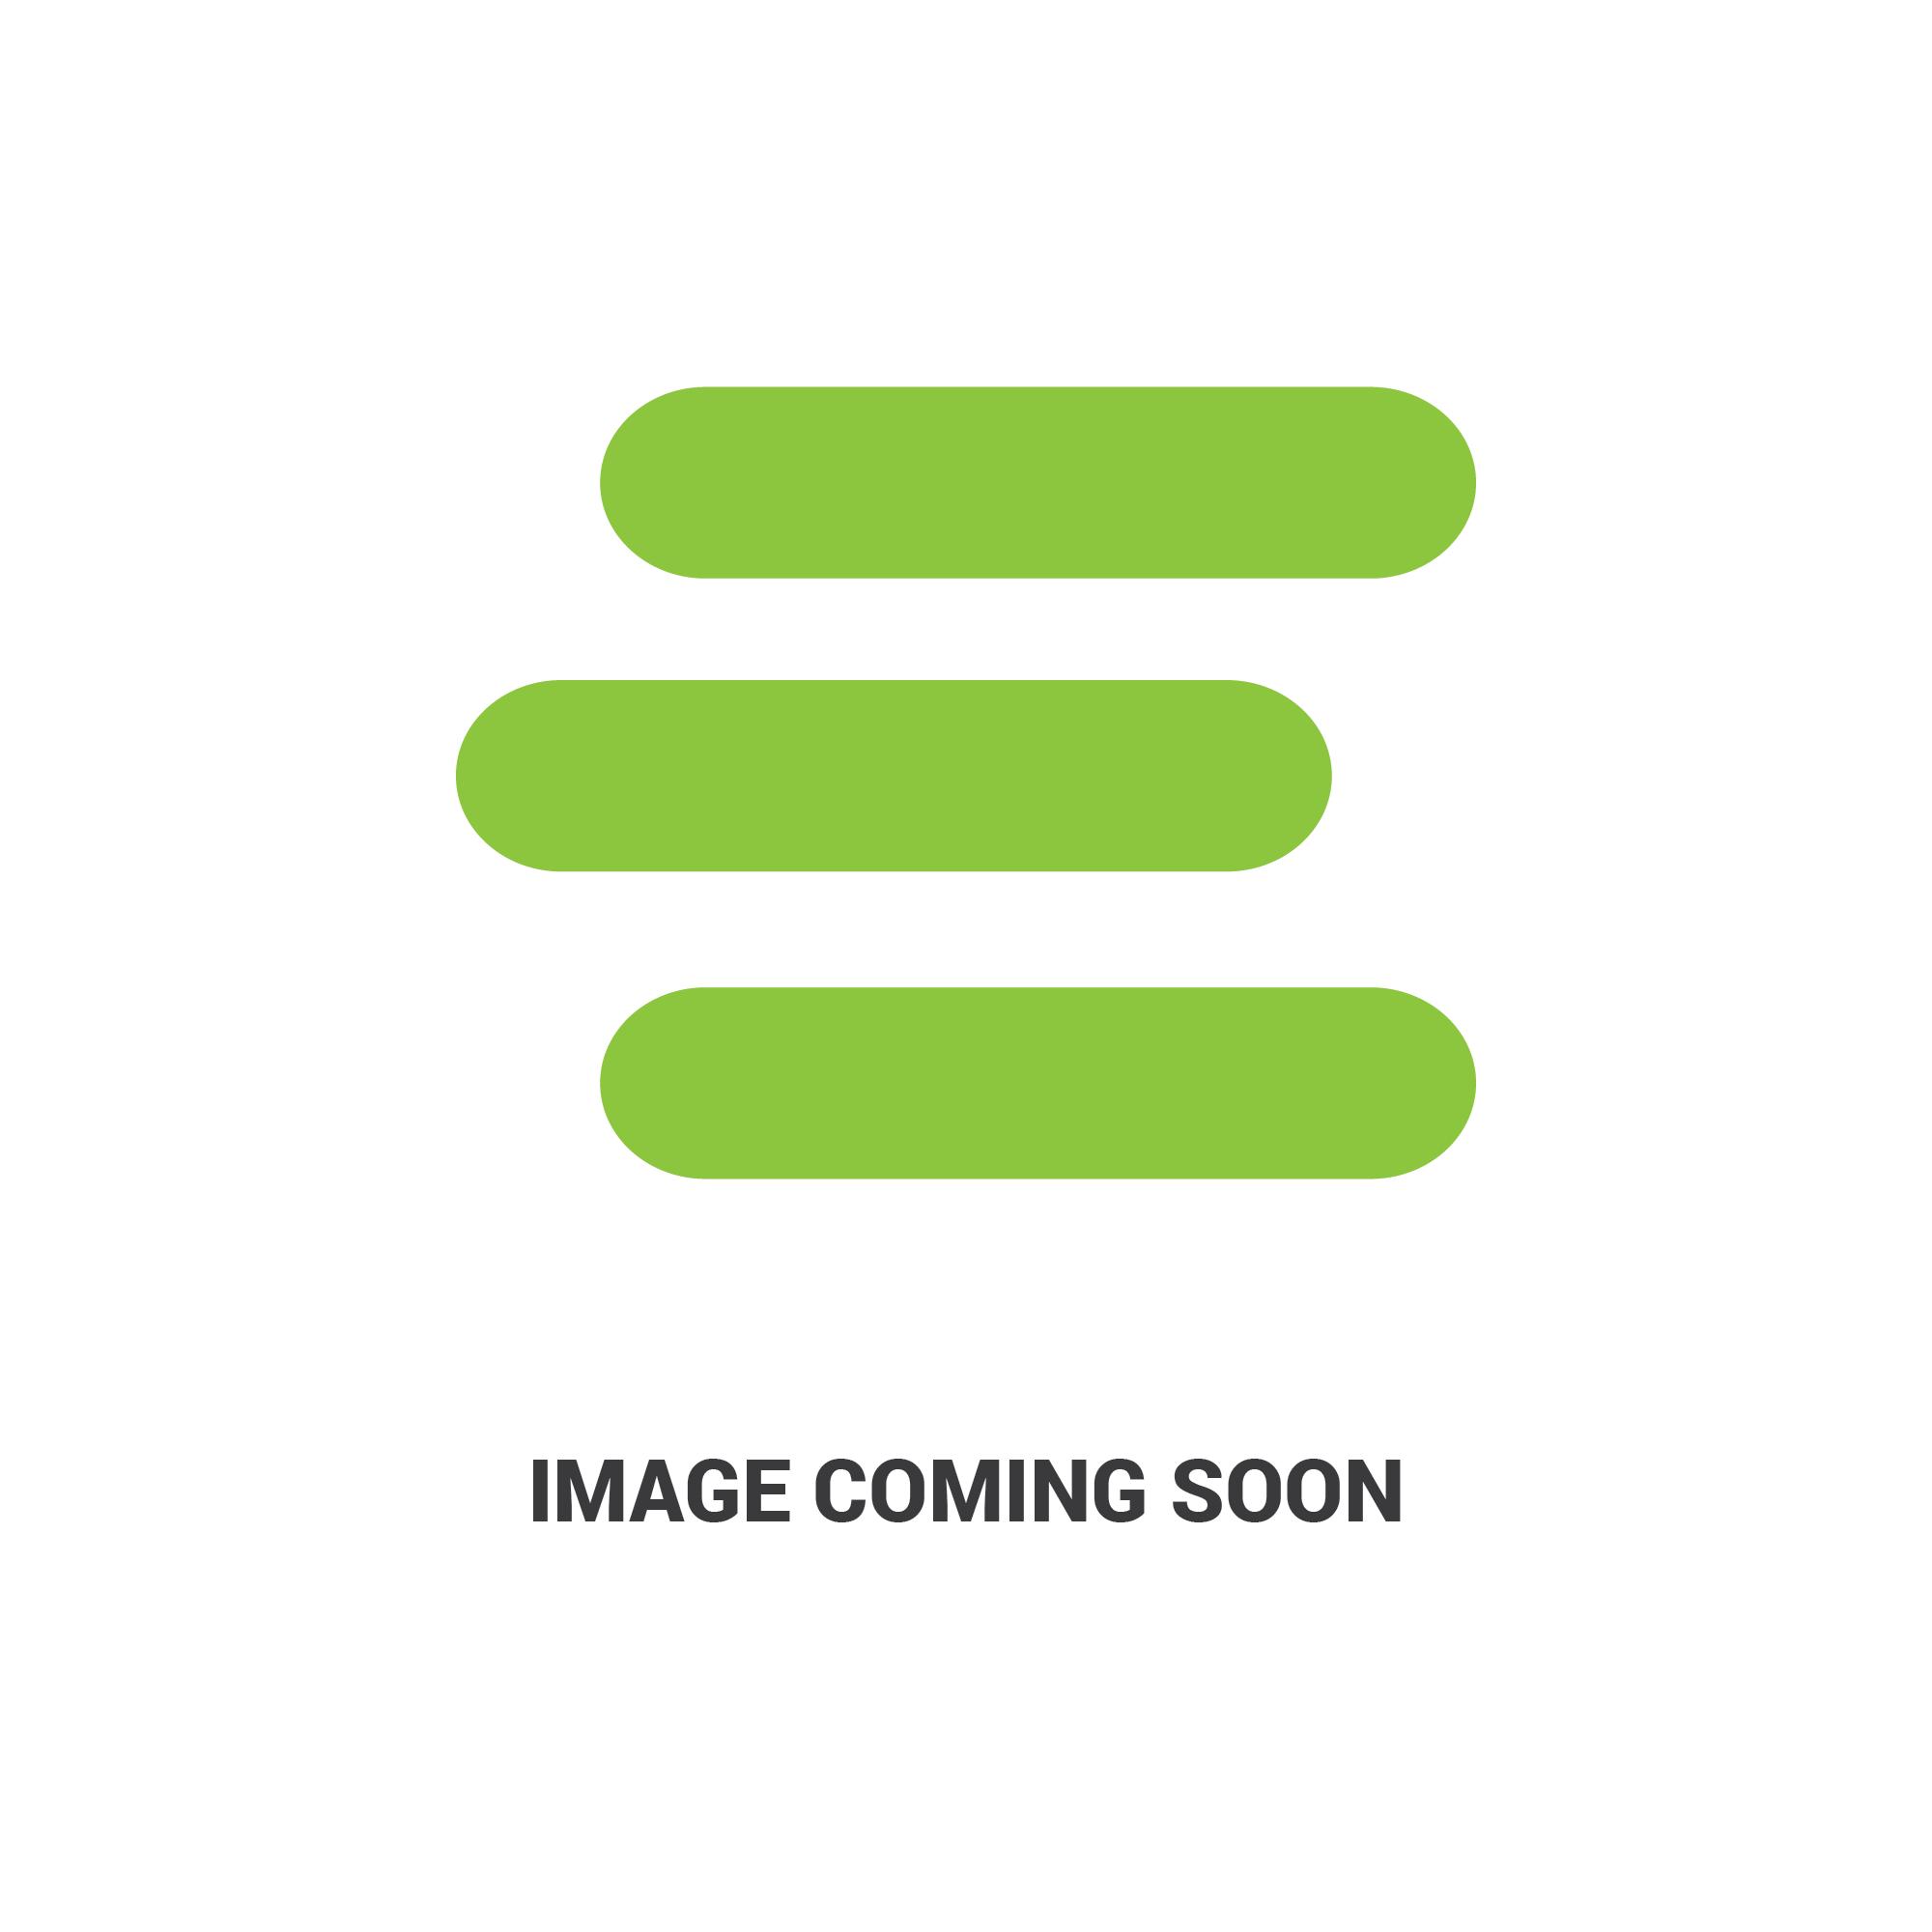 E-17331-65510edit 1.jpg